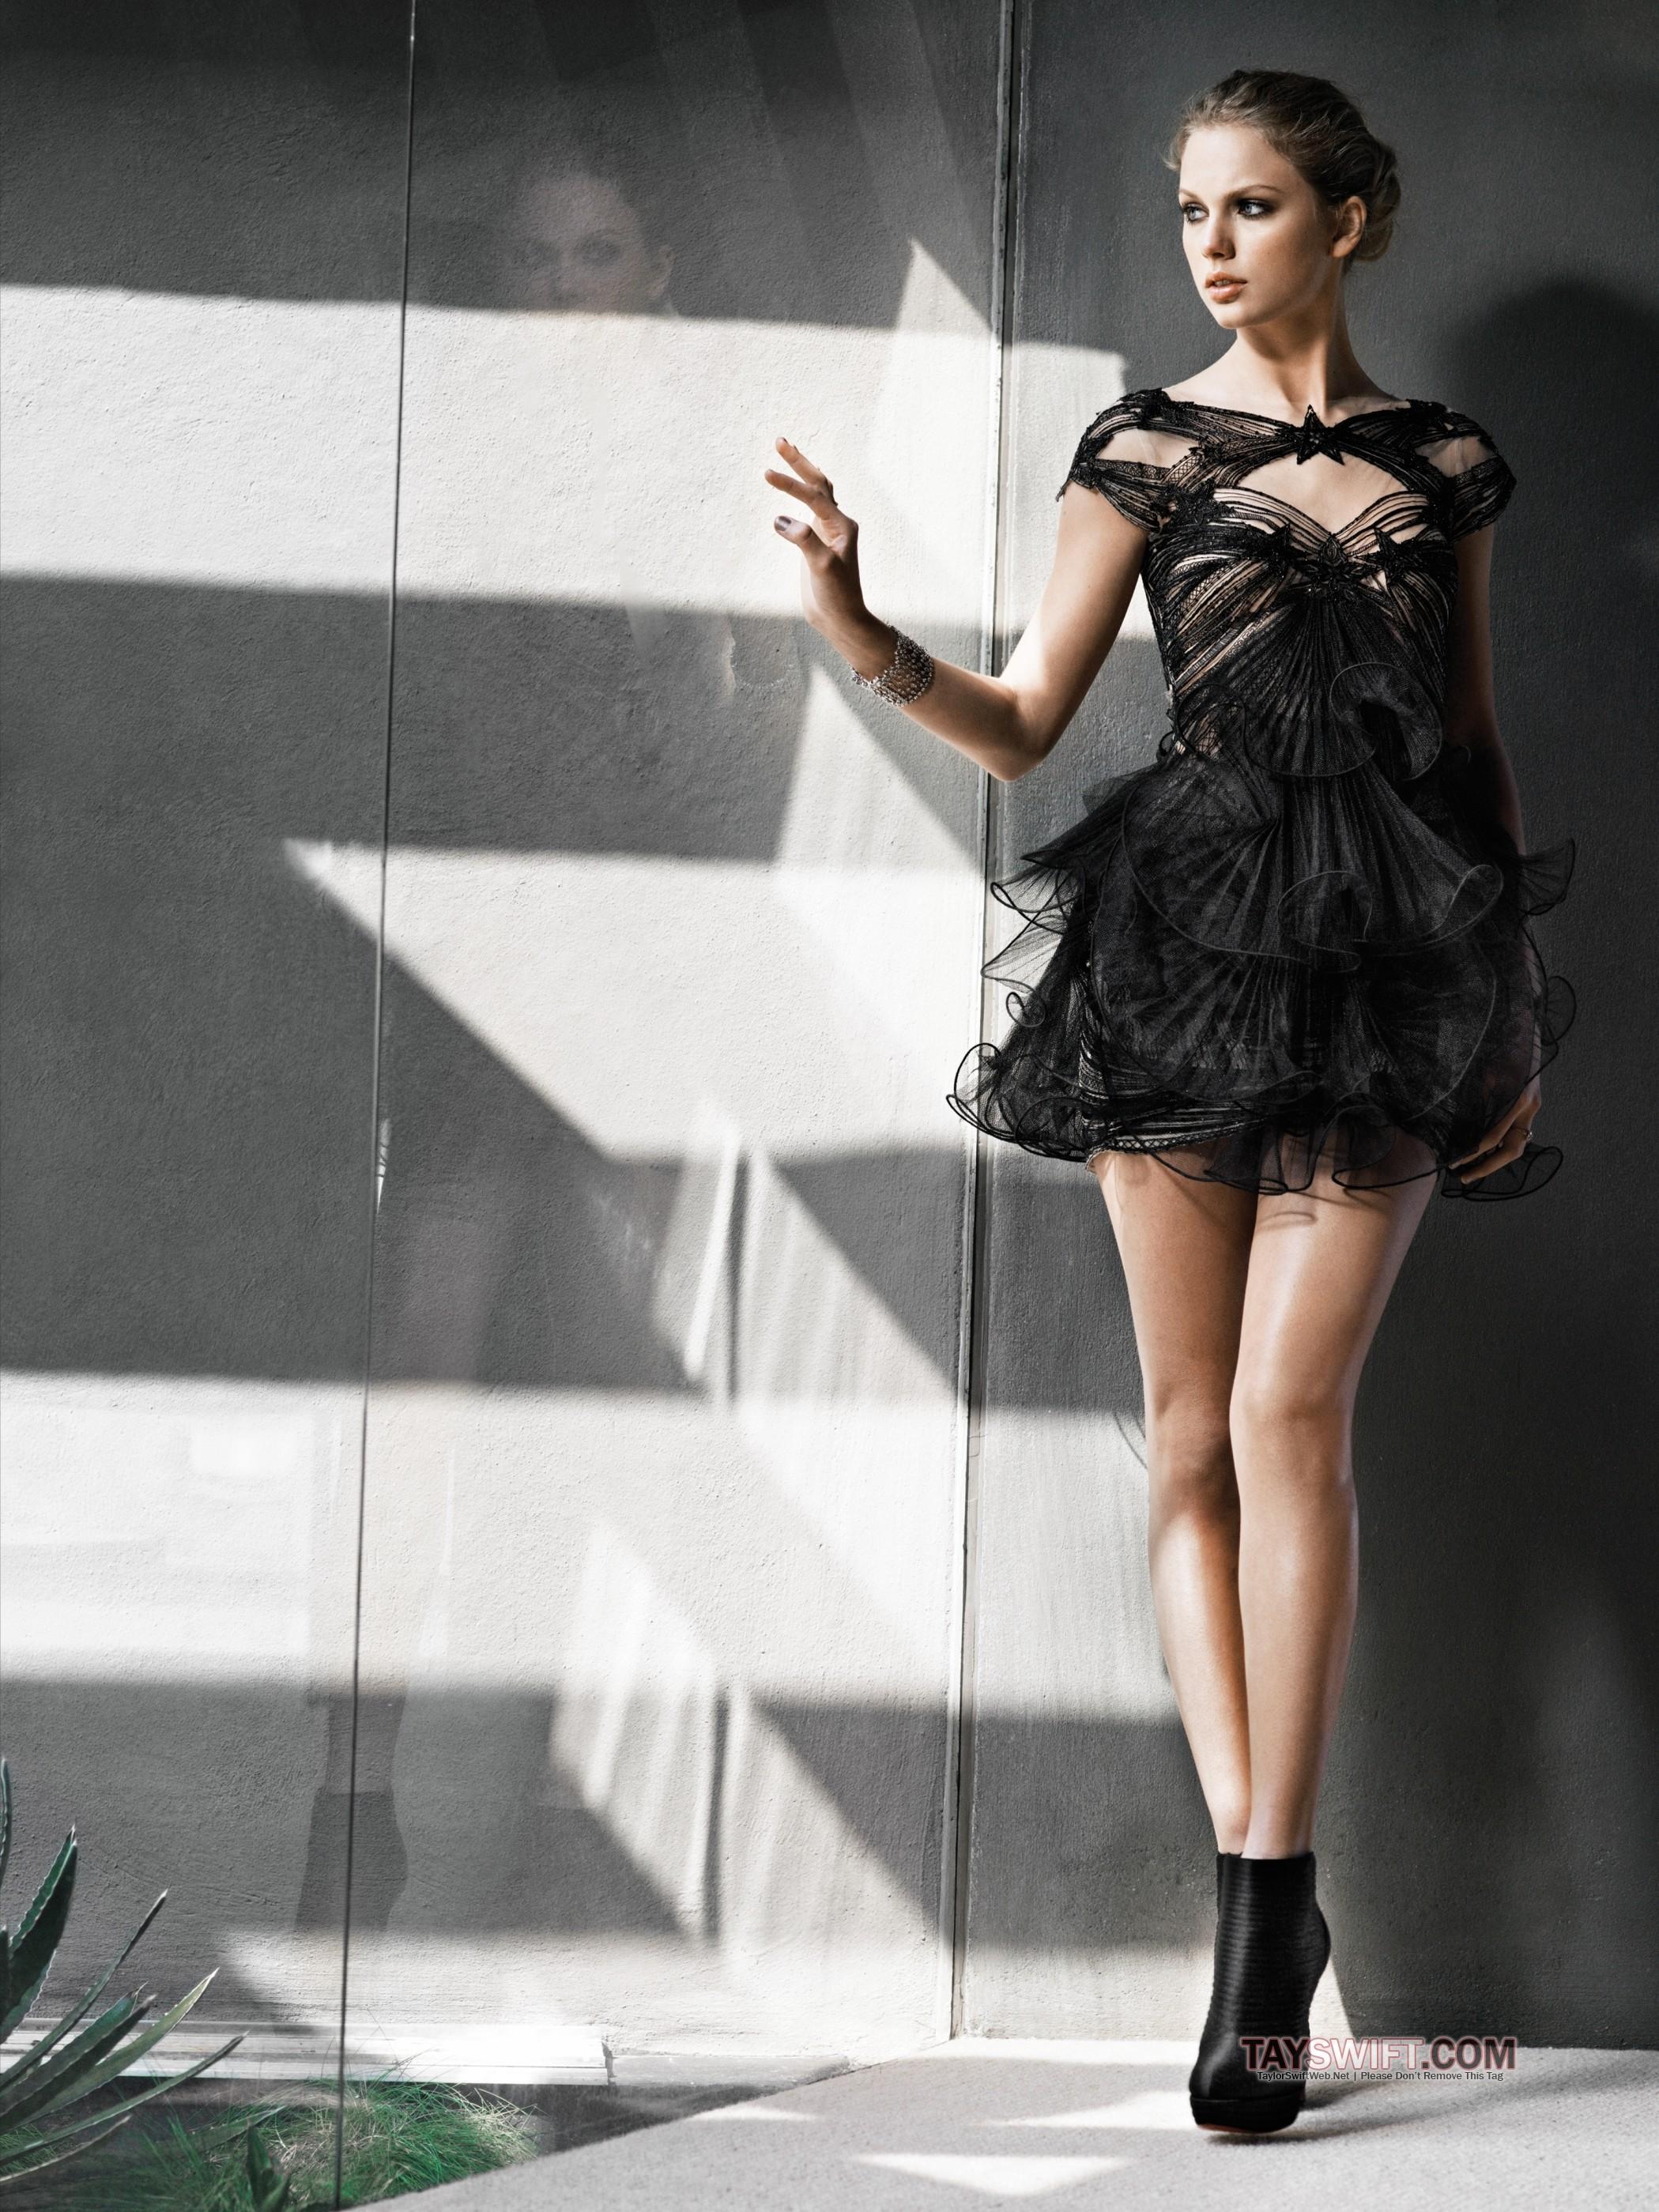 Hintergrundbilder : schwarz, Modell-, Taylor Swift, Mode, Frühling ...